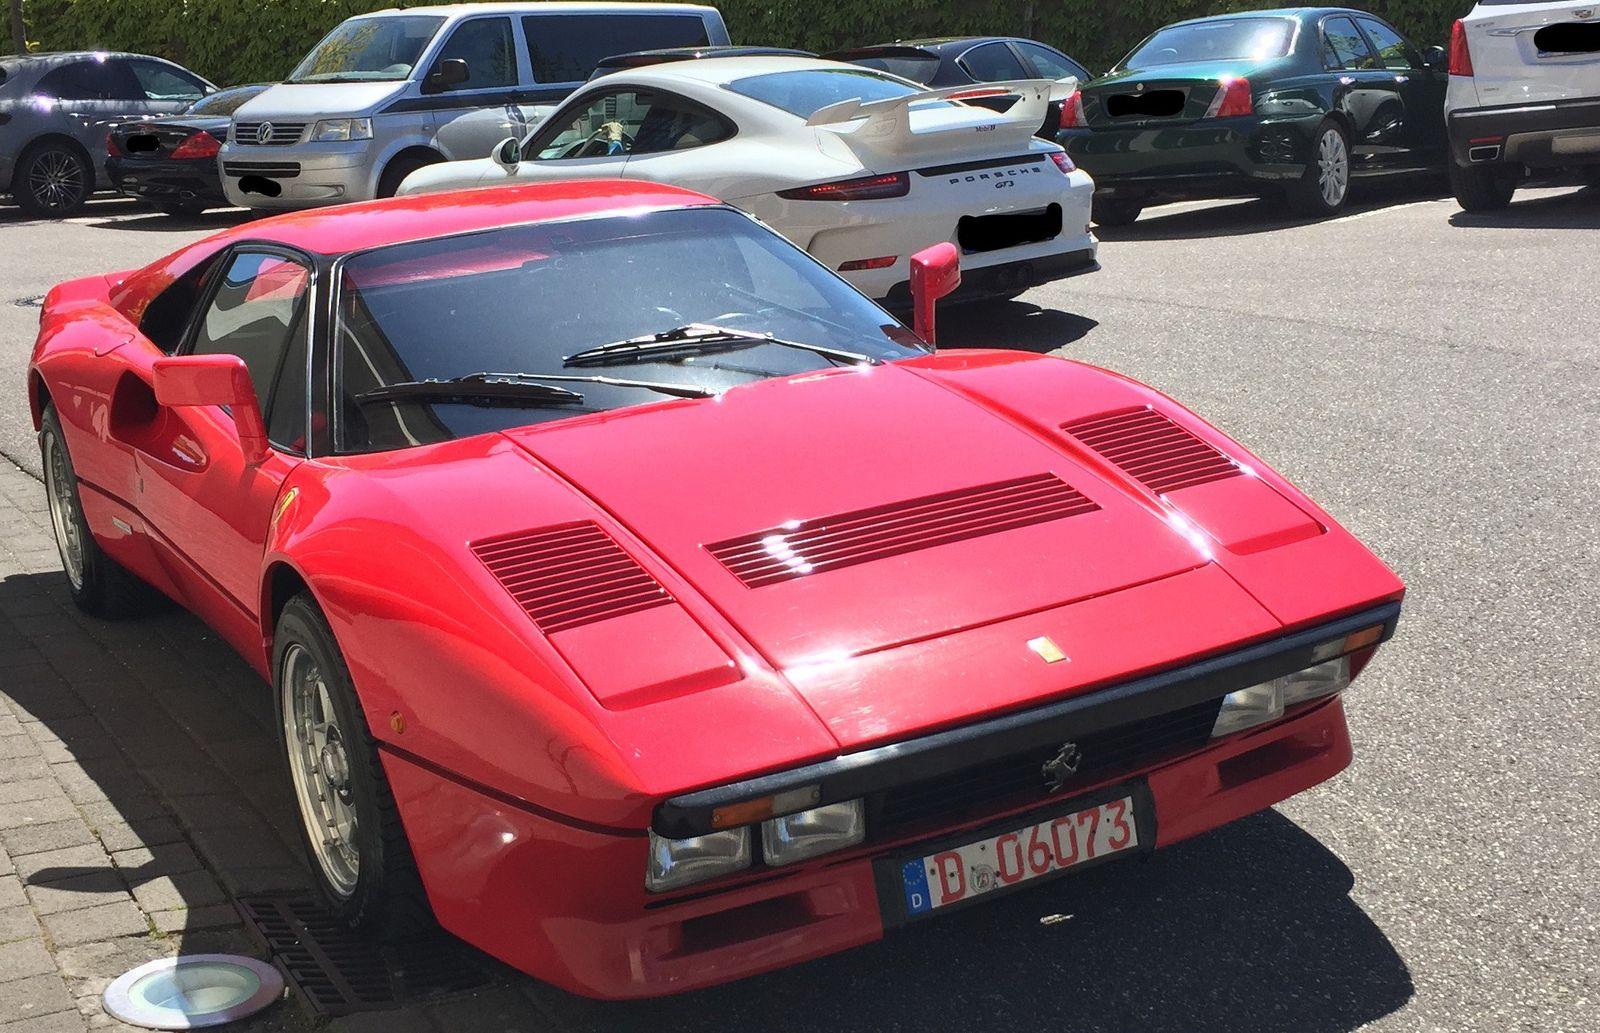 Gestohlener Ferrari